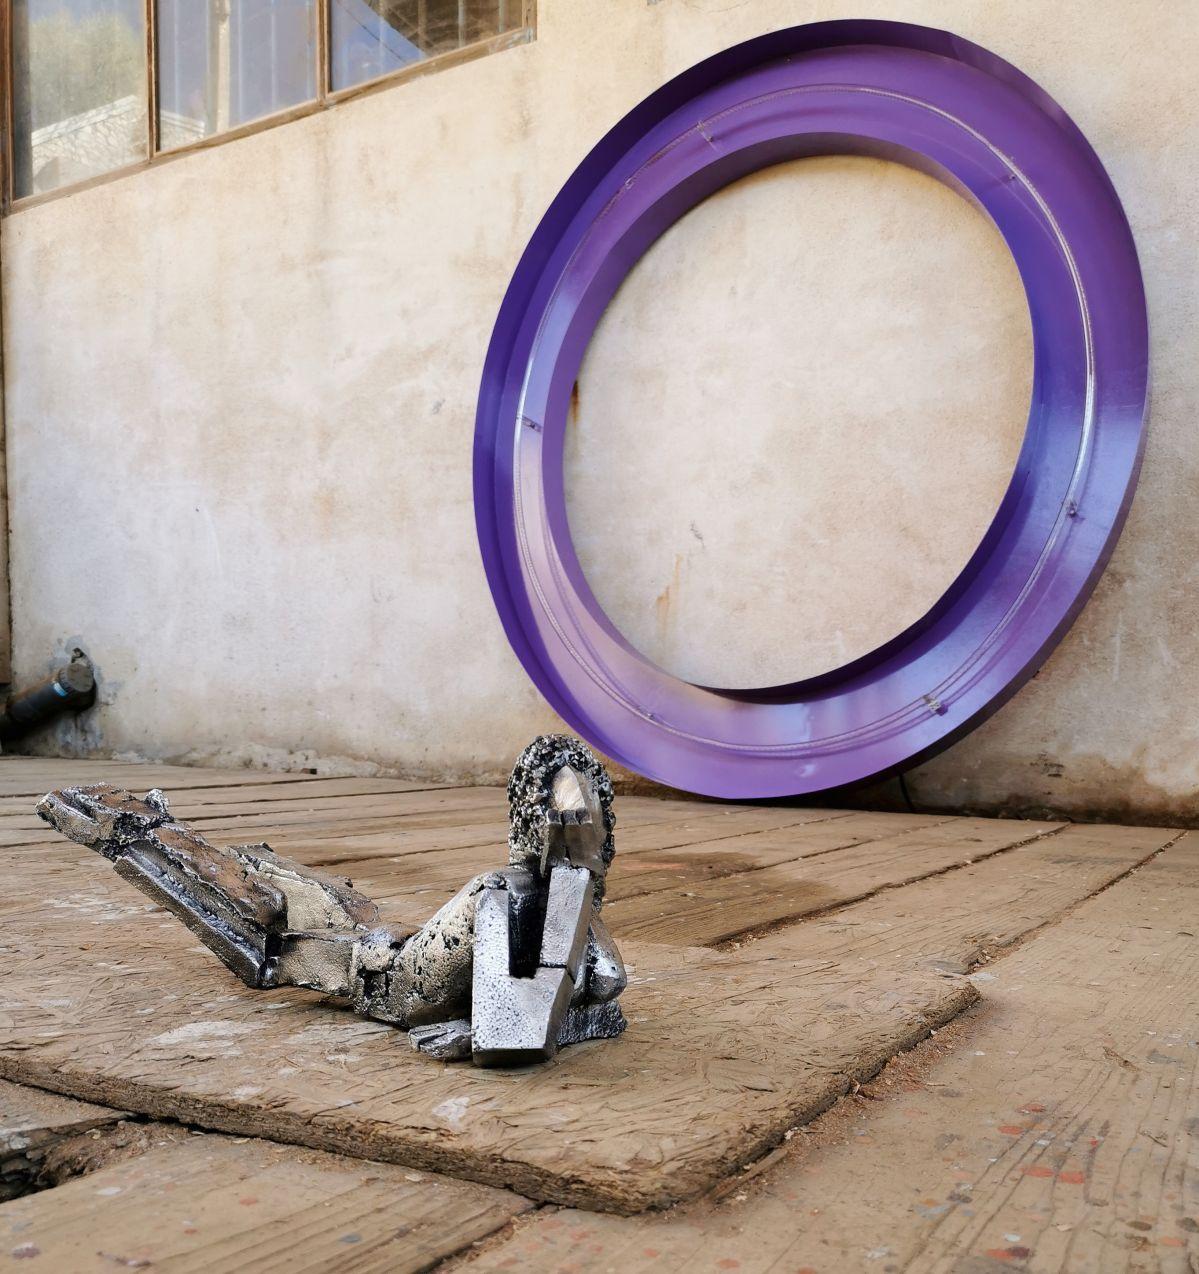 Olivier Millagou - Julie, 2020 et O violet, 2020 - «Winter A-Go-Go» au Chantier Naval Borg - PAC 2020 - Marseille